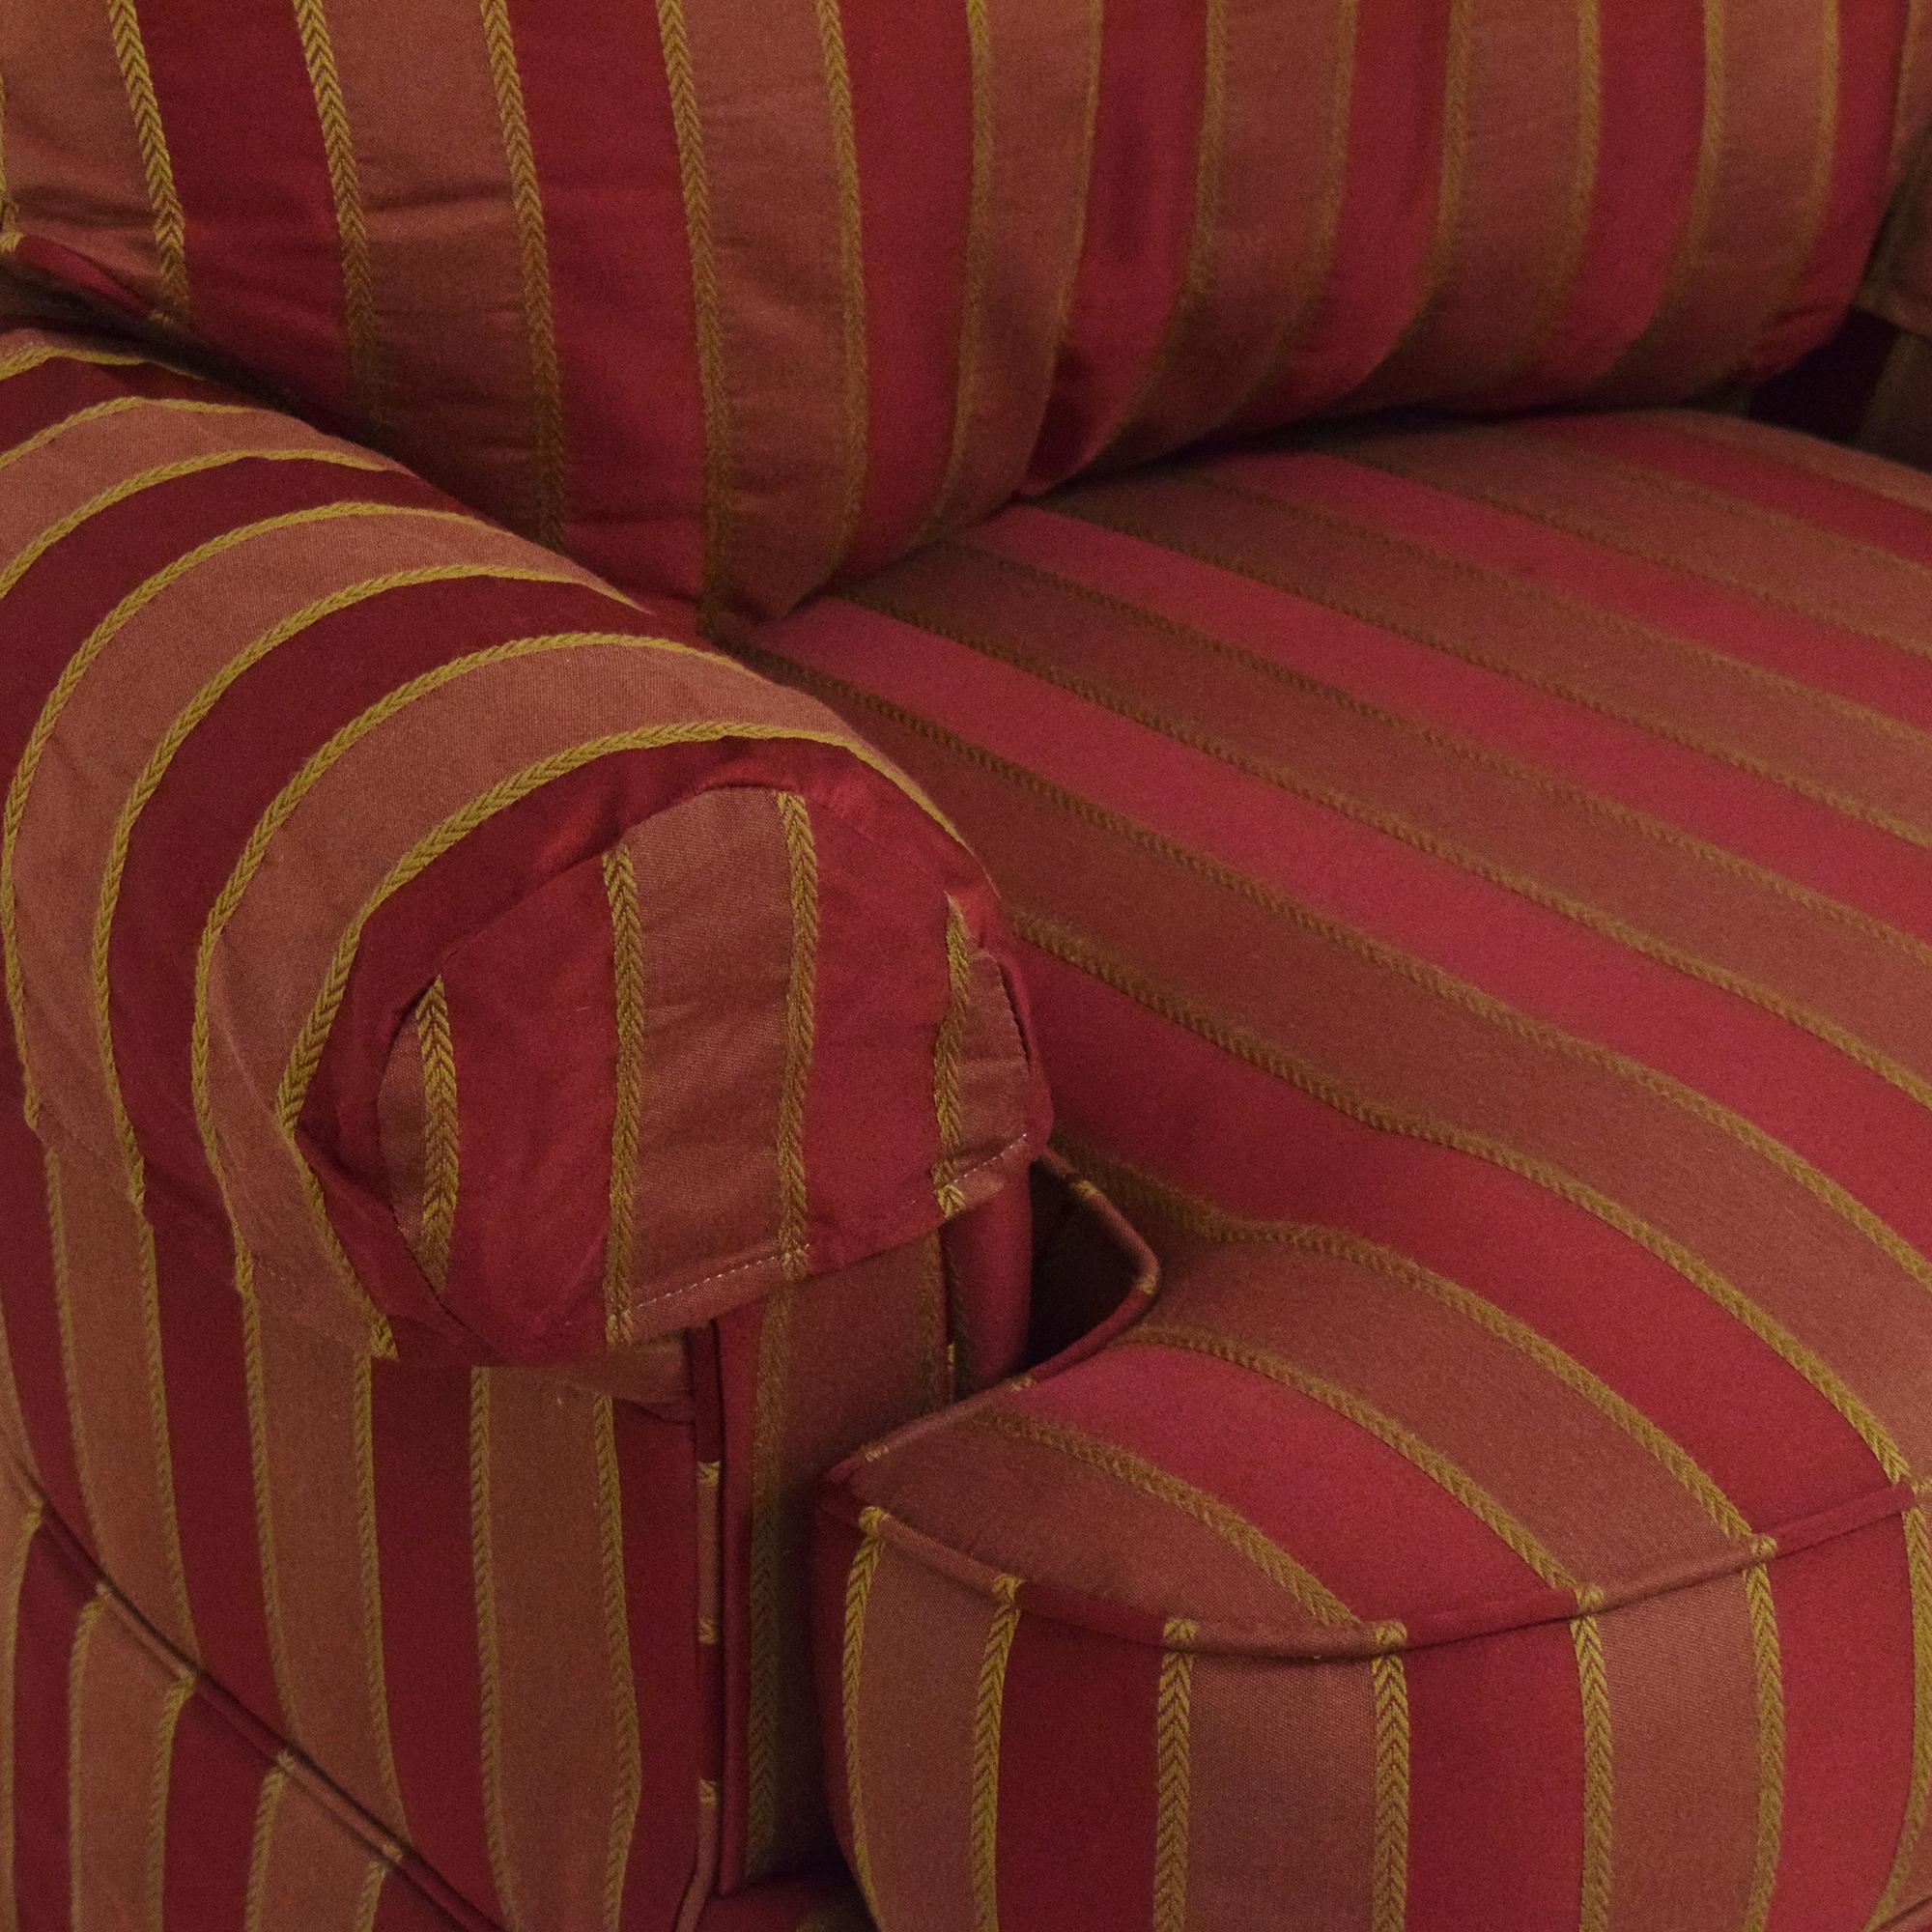 Ethan Allen Ethan Allen Skirted Swivel Chair coupon